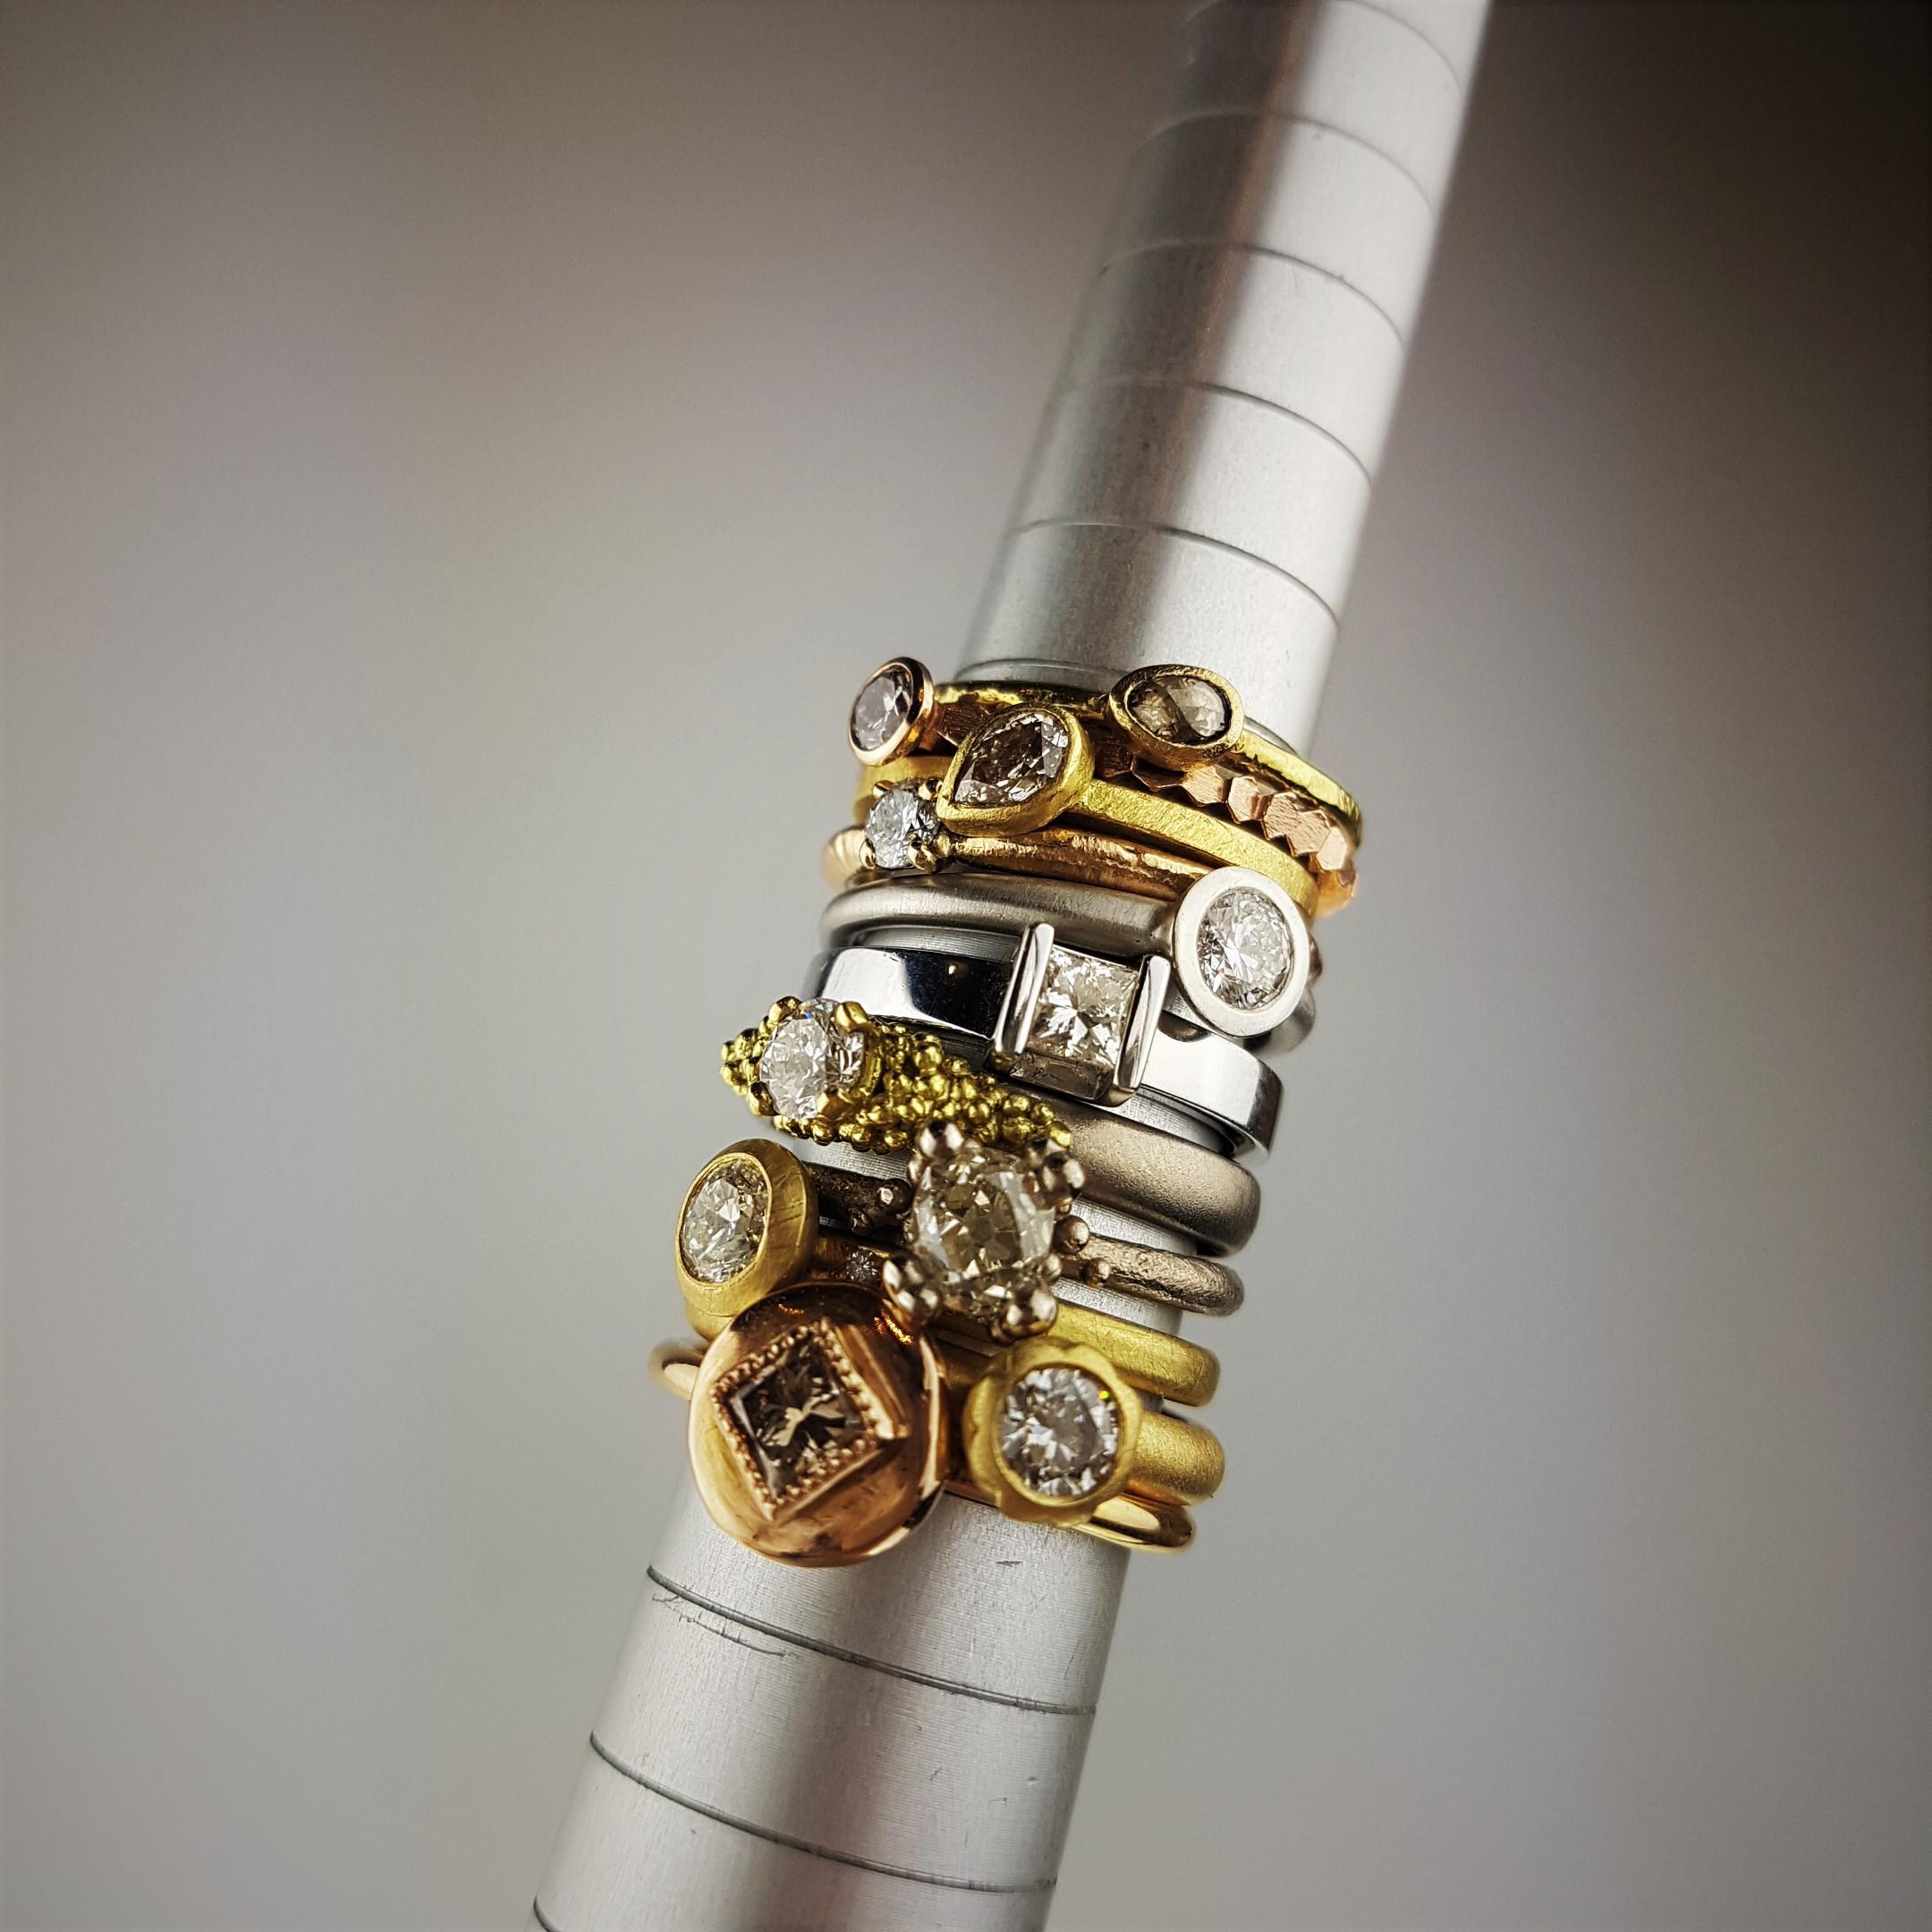 gill wing jewellery diamond engagement rings.jpg